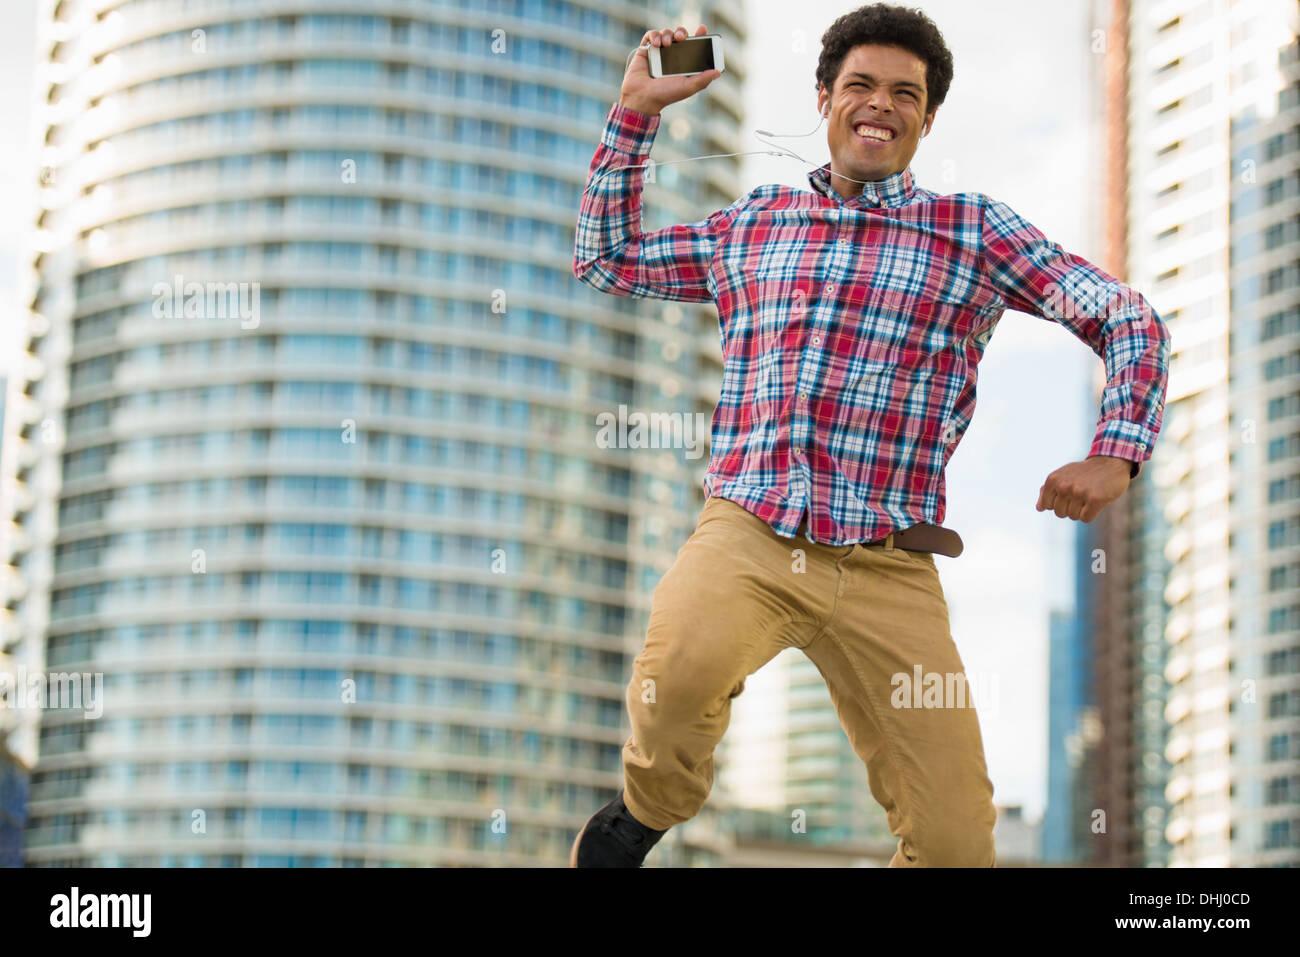 Hombre con teléfono móvil saltar de alegría Imagen De Stock